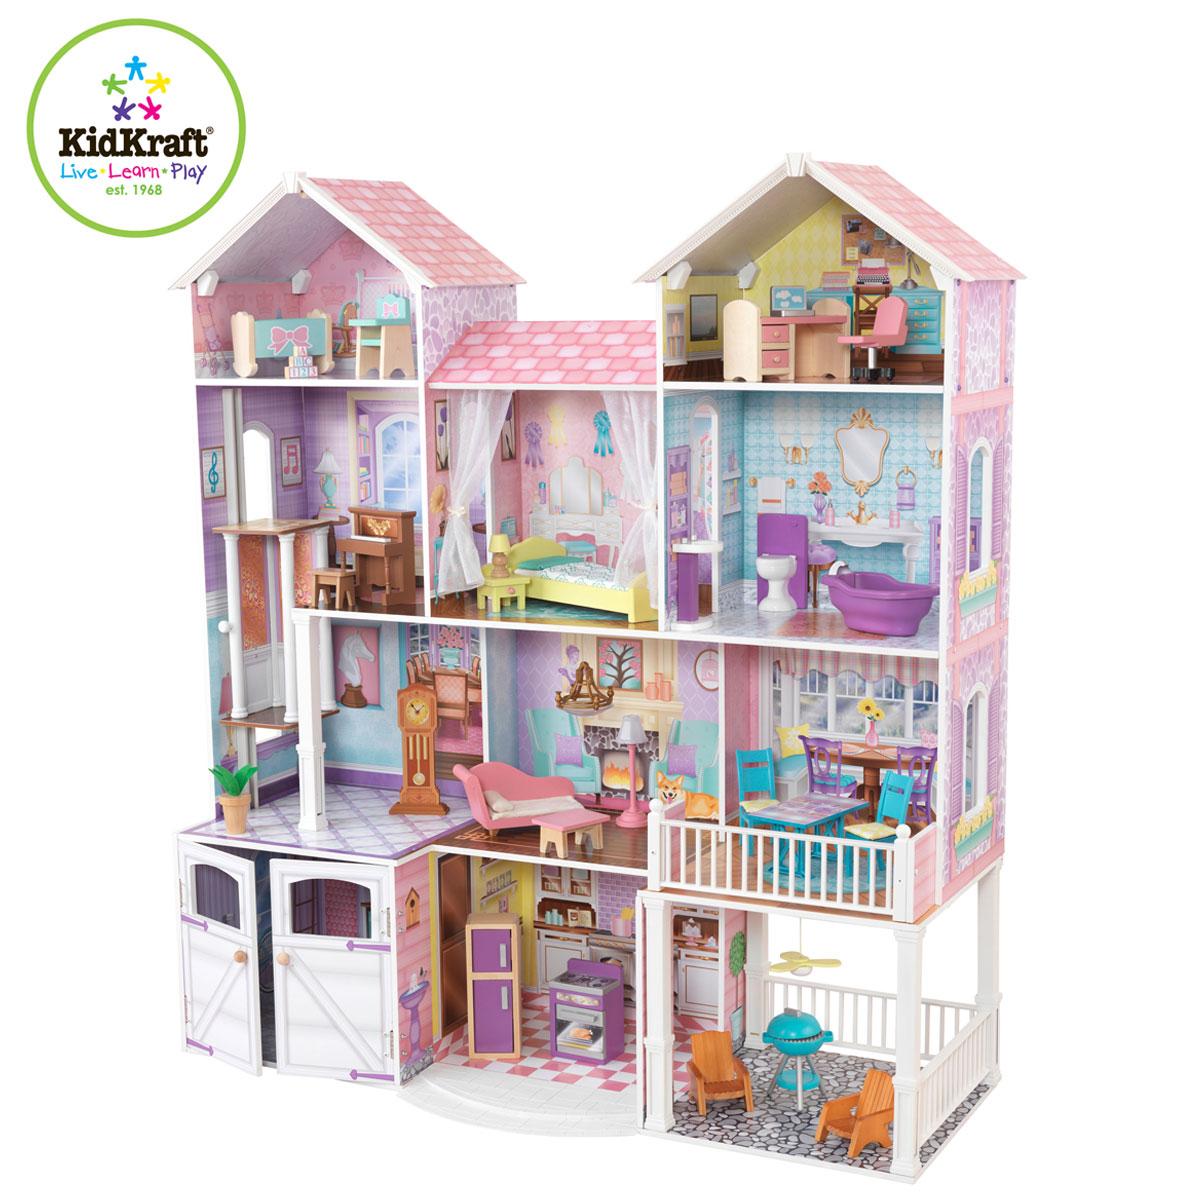 kidkraft casa delle bambole country estate - 65242 - pirum